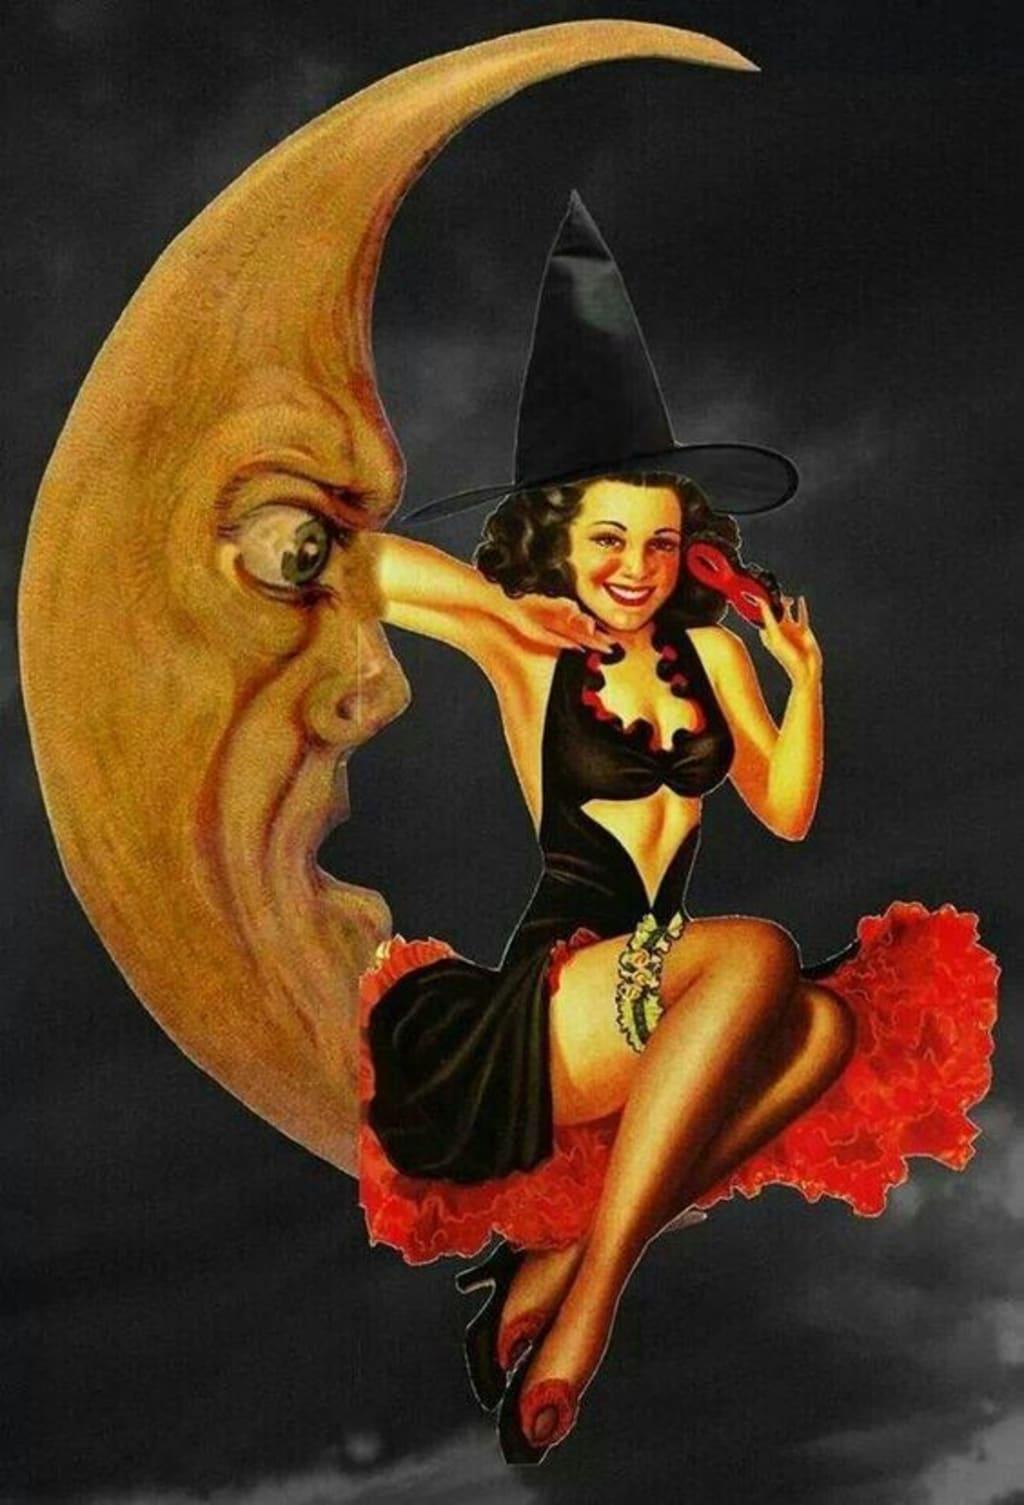 Haunted: October 2020's Full Moon in Taurus